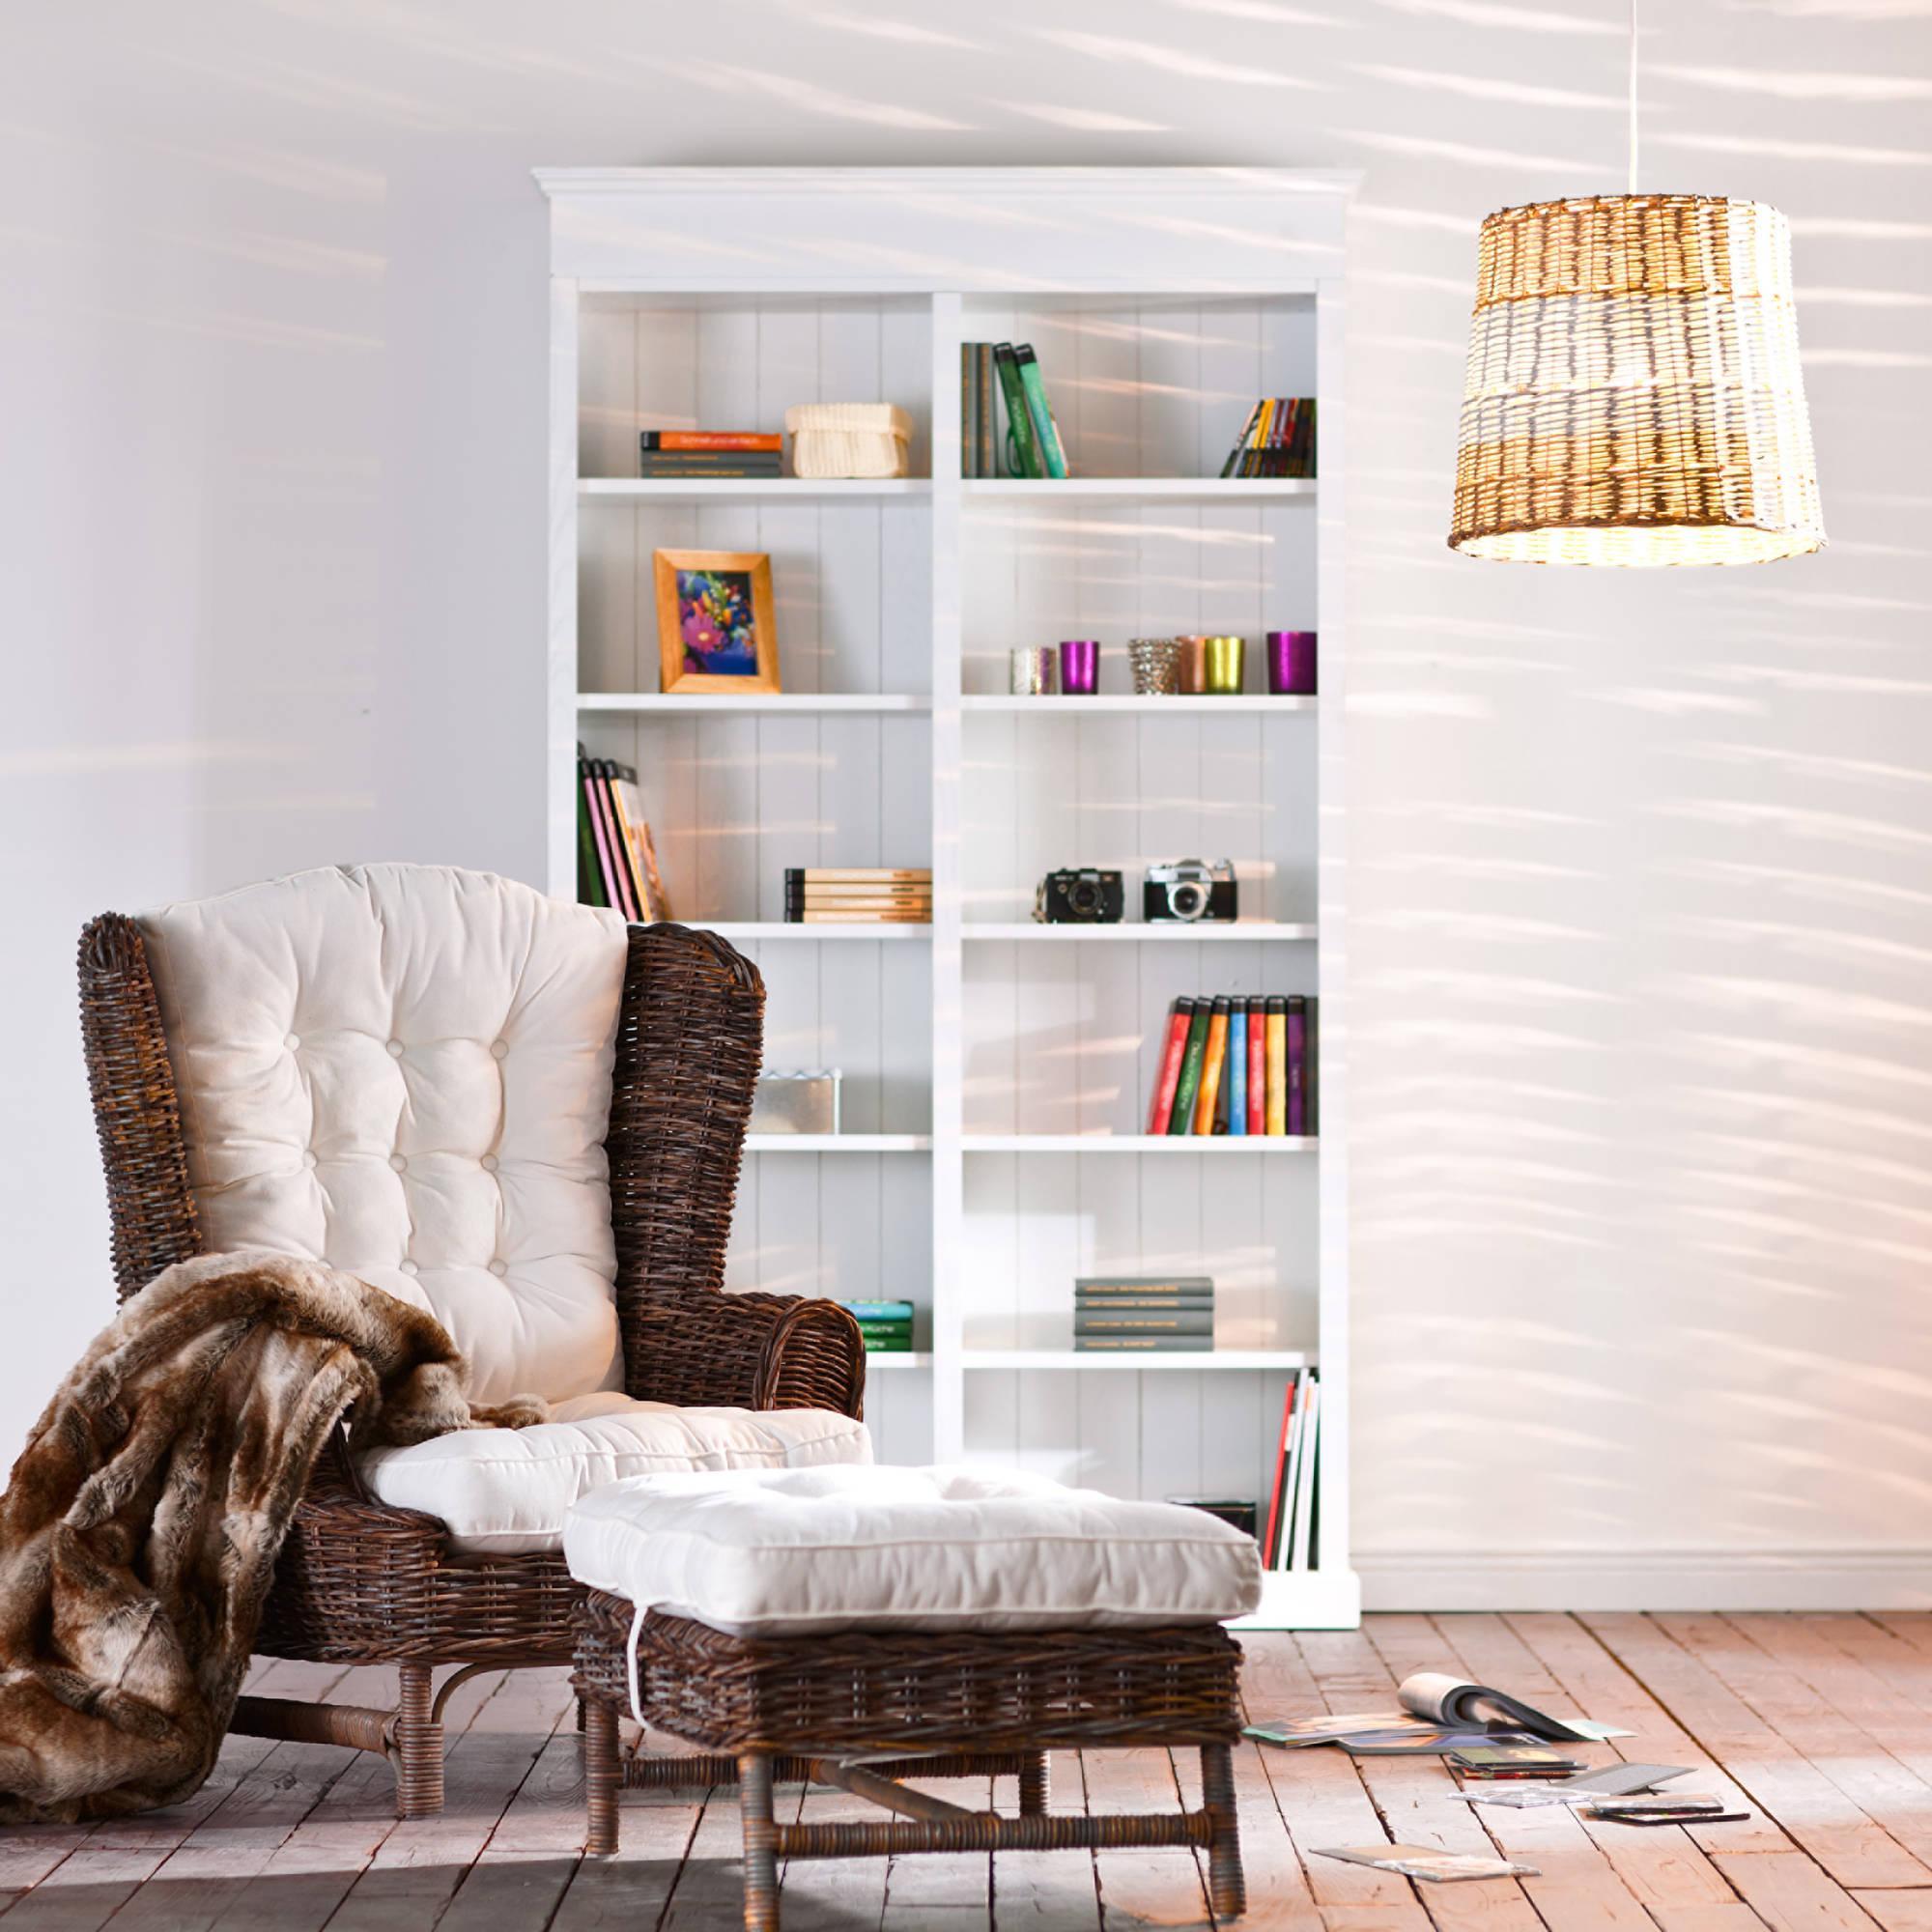 ohrensessel bilder ideen couchstyle. Black Bedroom Furniture Sets. Home Design Ideas